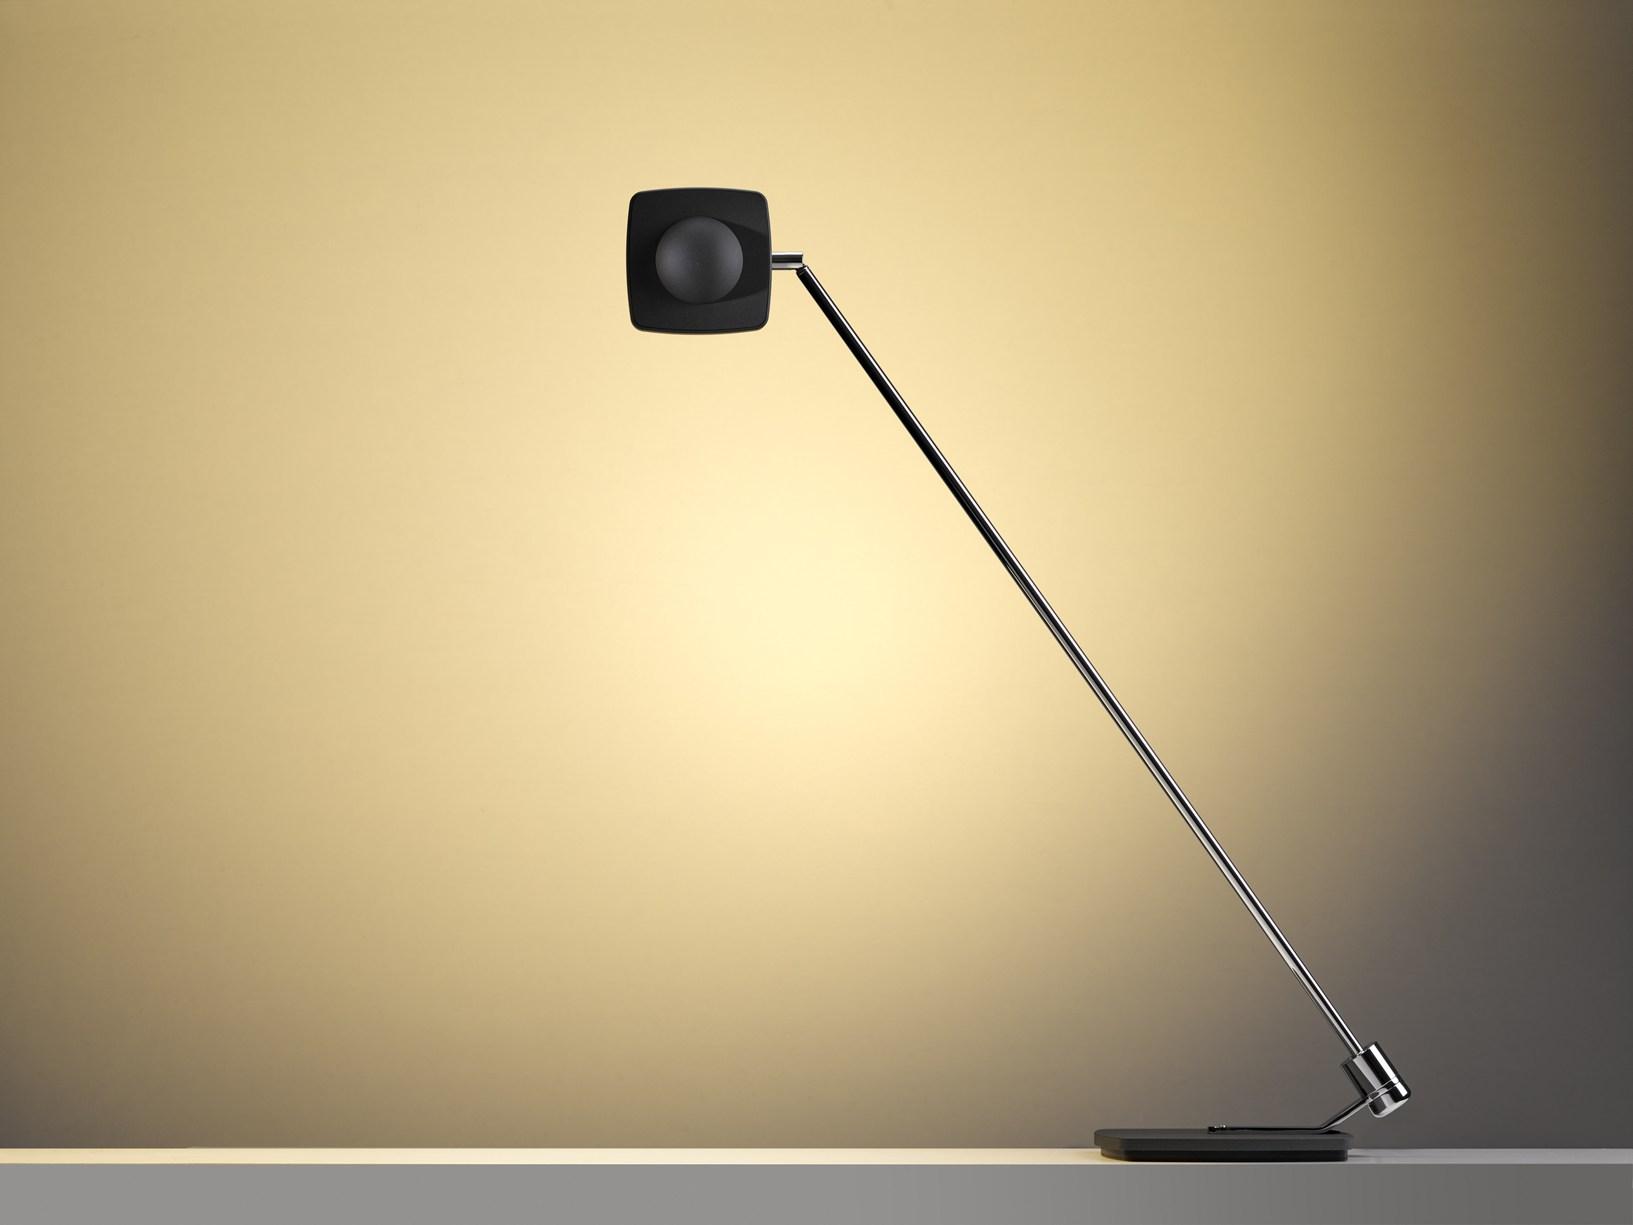 Kelveen Lamp by Oligo